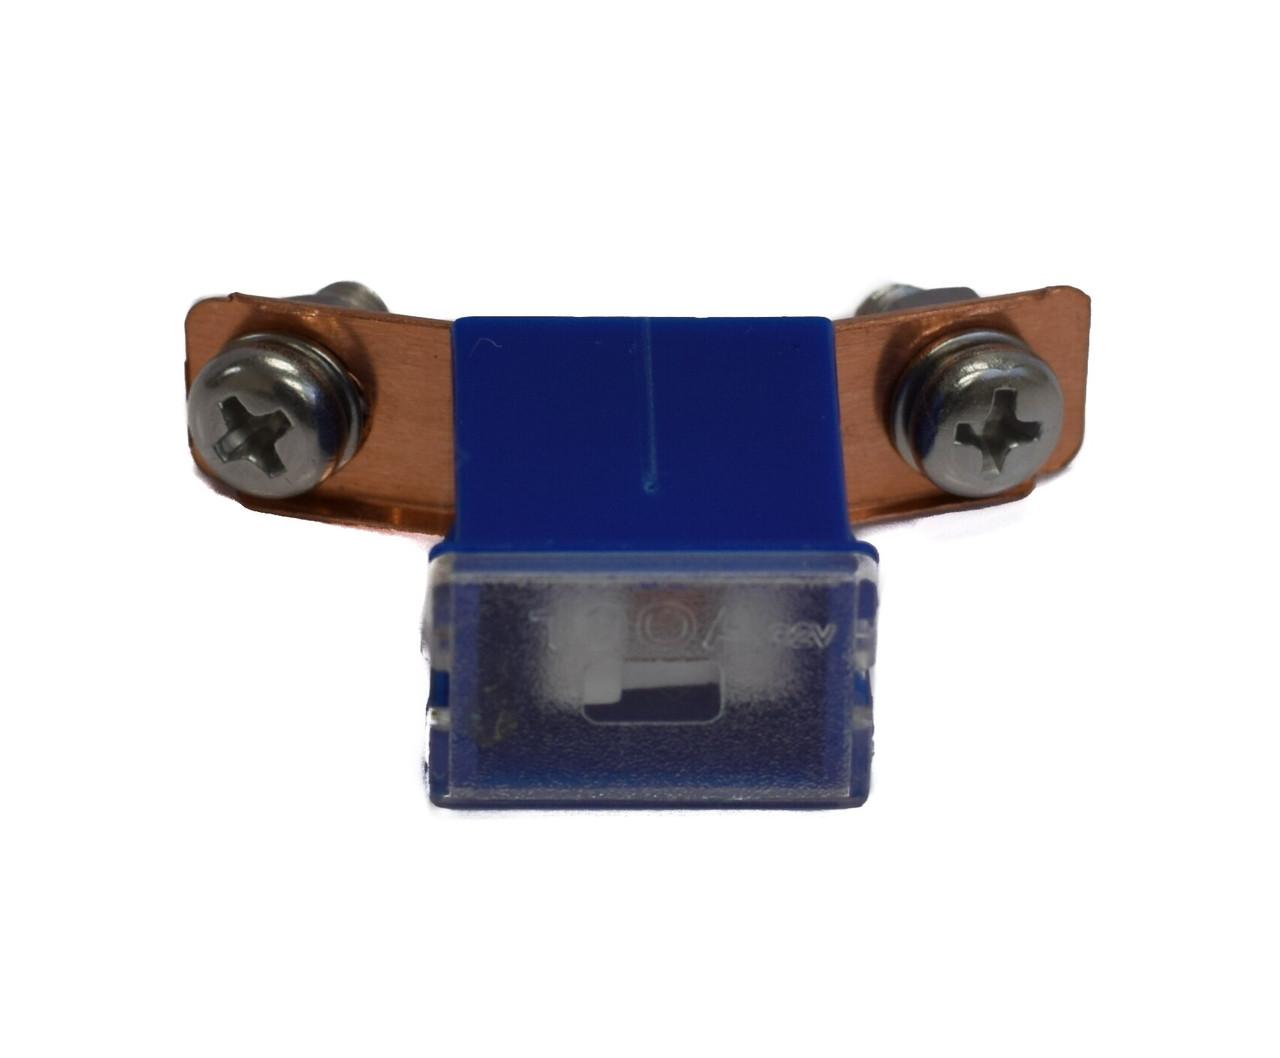 Raion Power RBC7 100A Fuse Includes Nuts & Bolts For APC SU1400X106